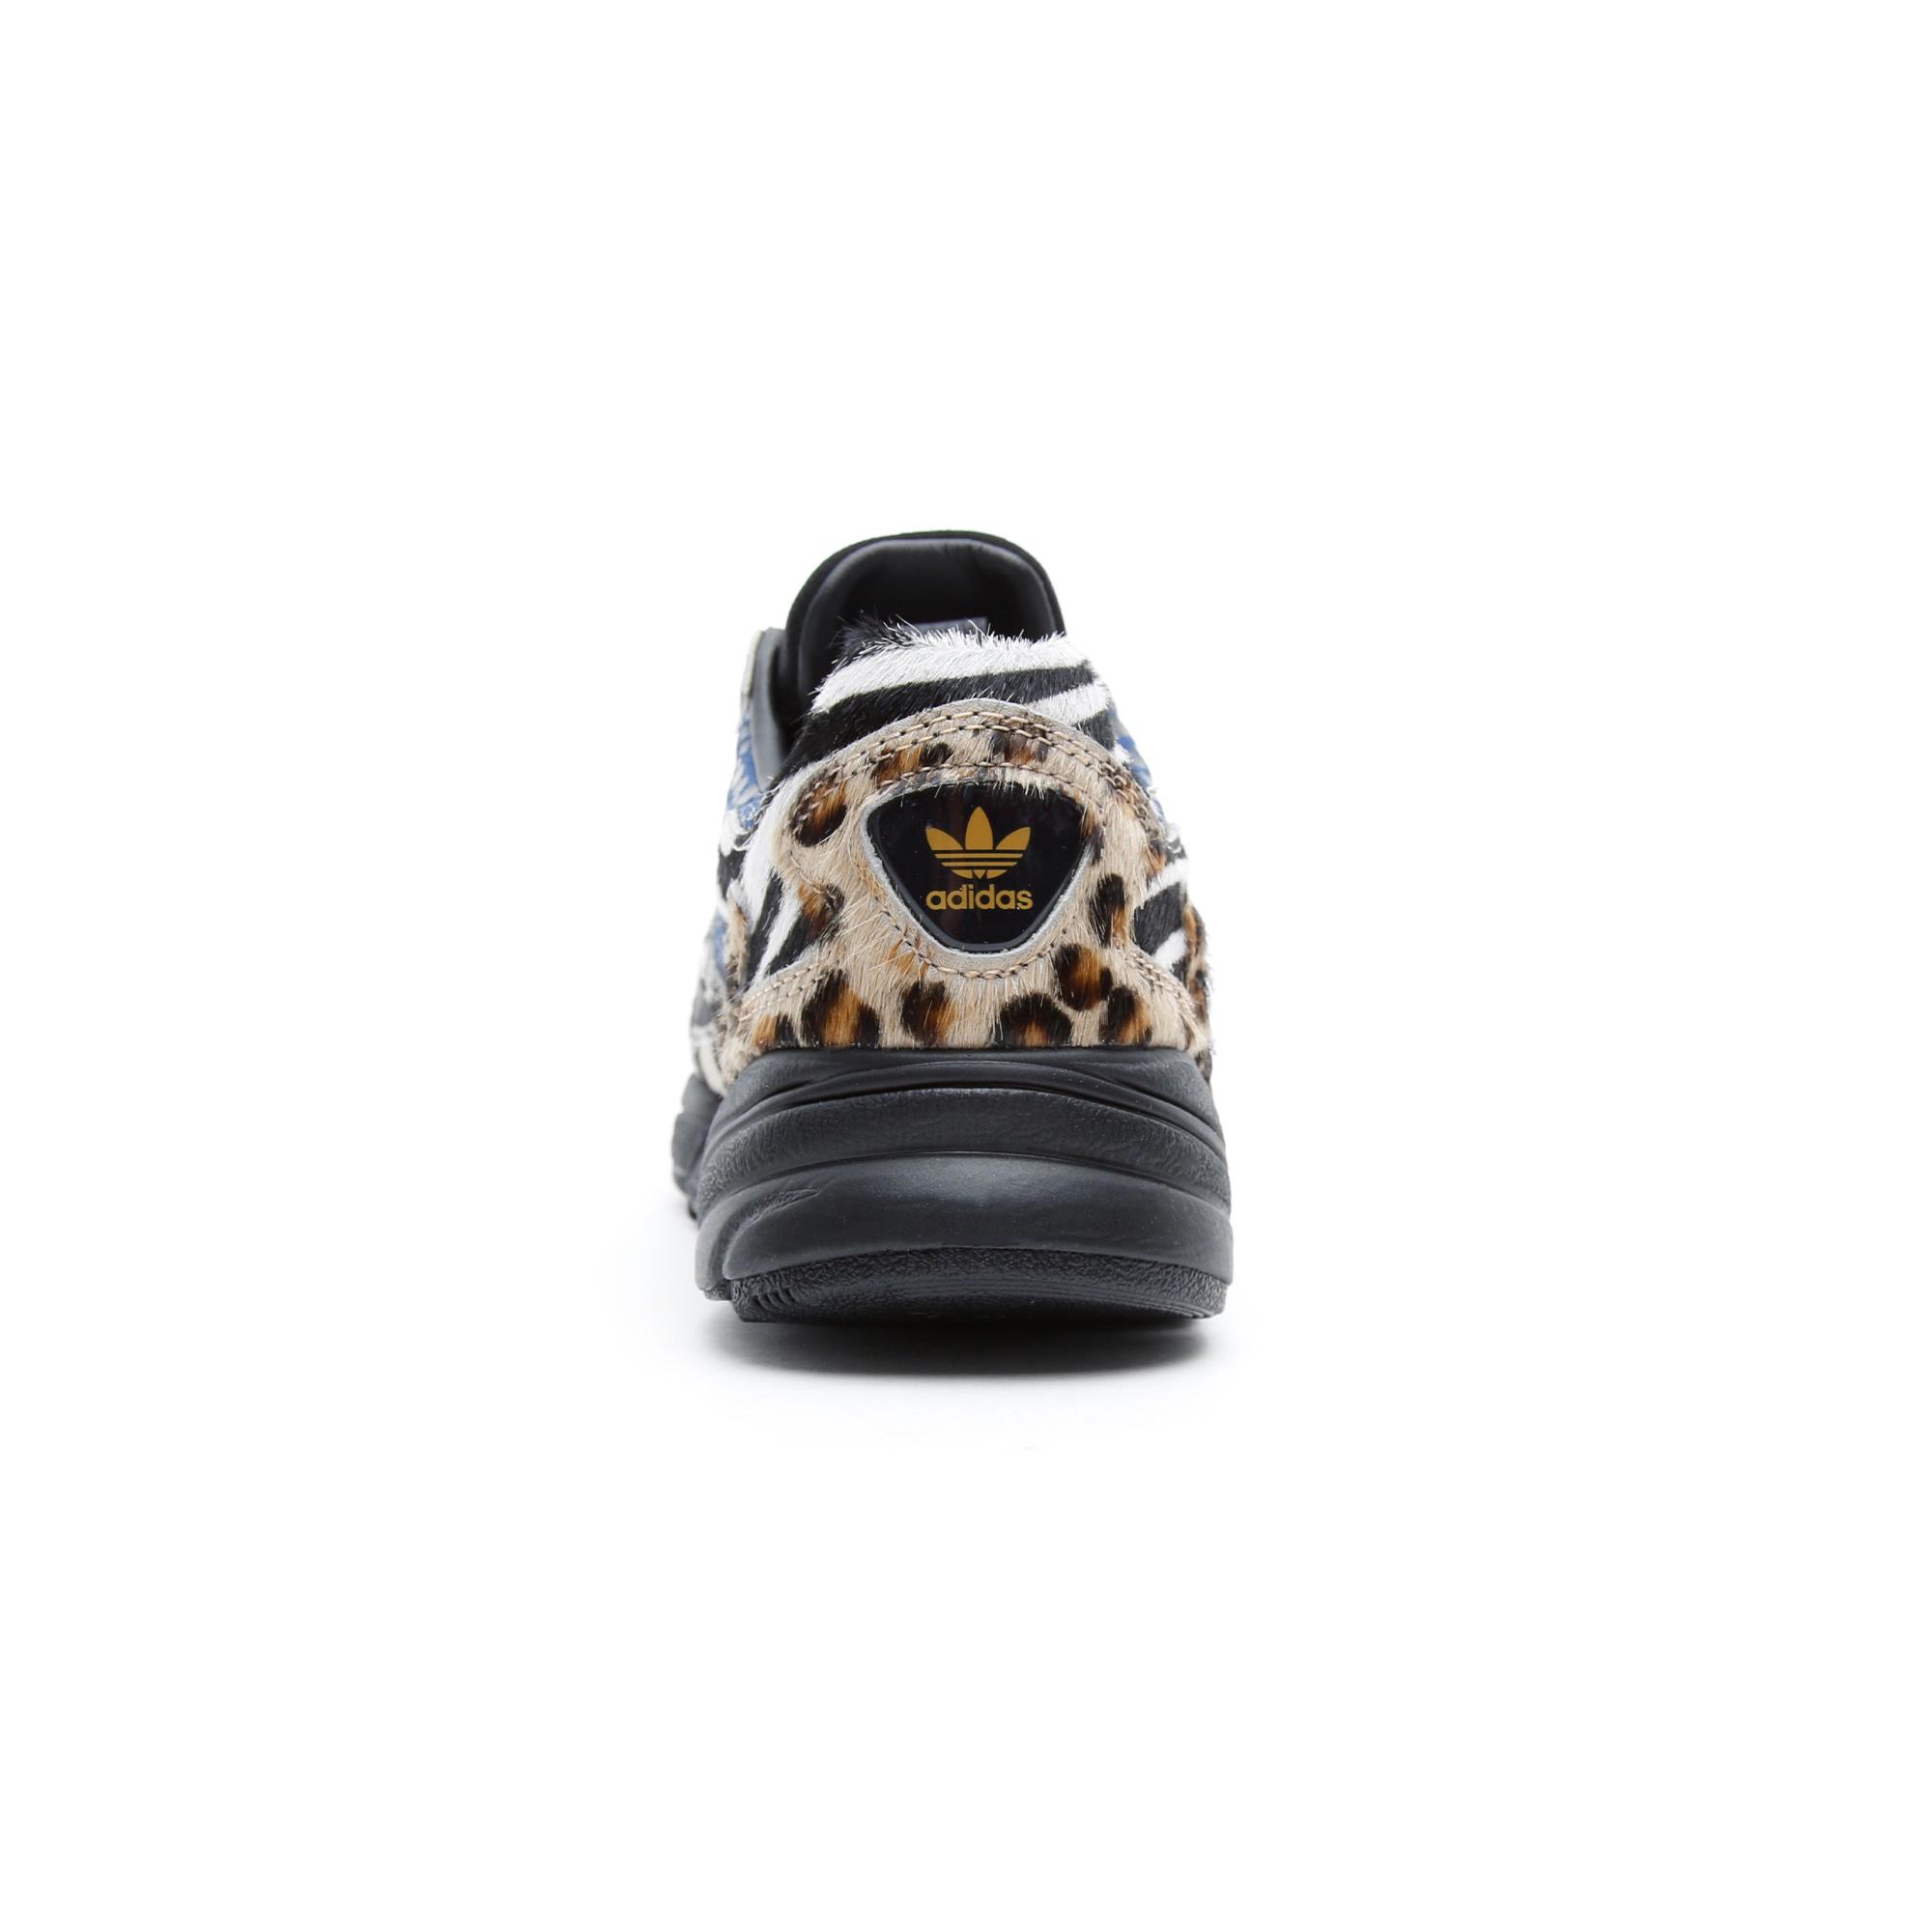 adidas Originals Falcon Kadın Lacivert Spor Ayakkabı